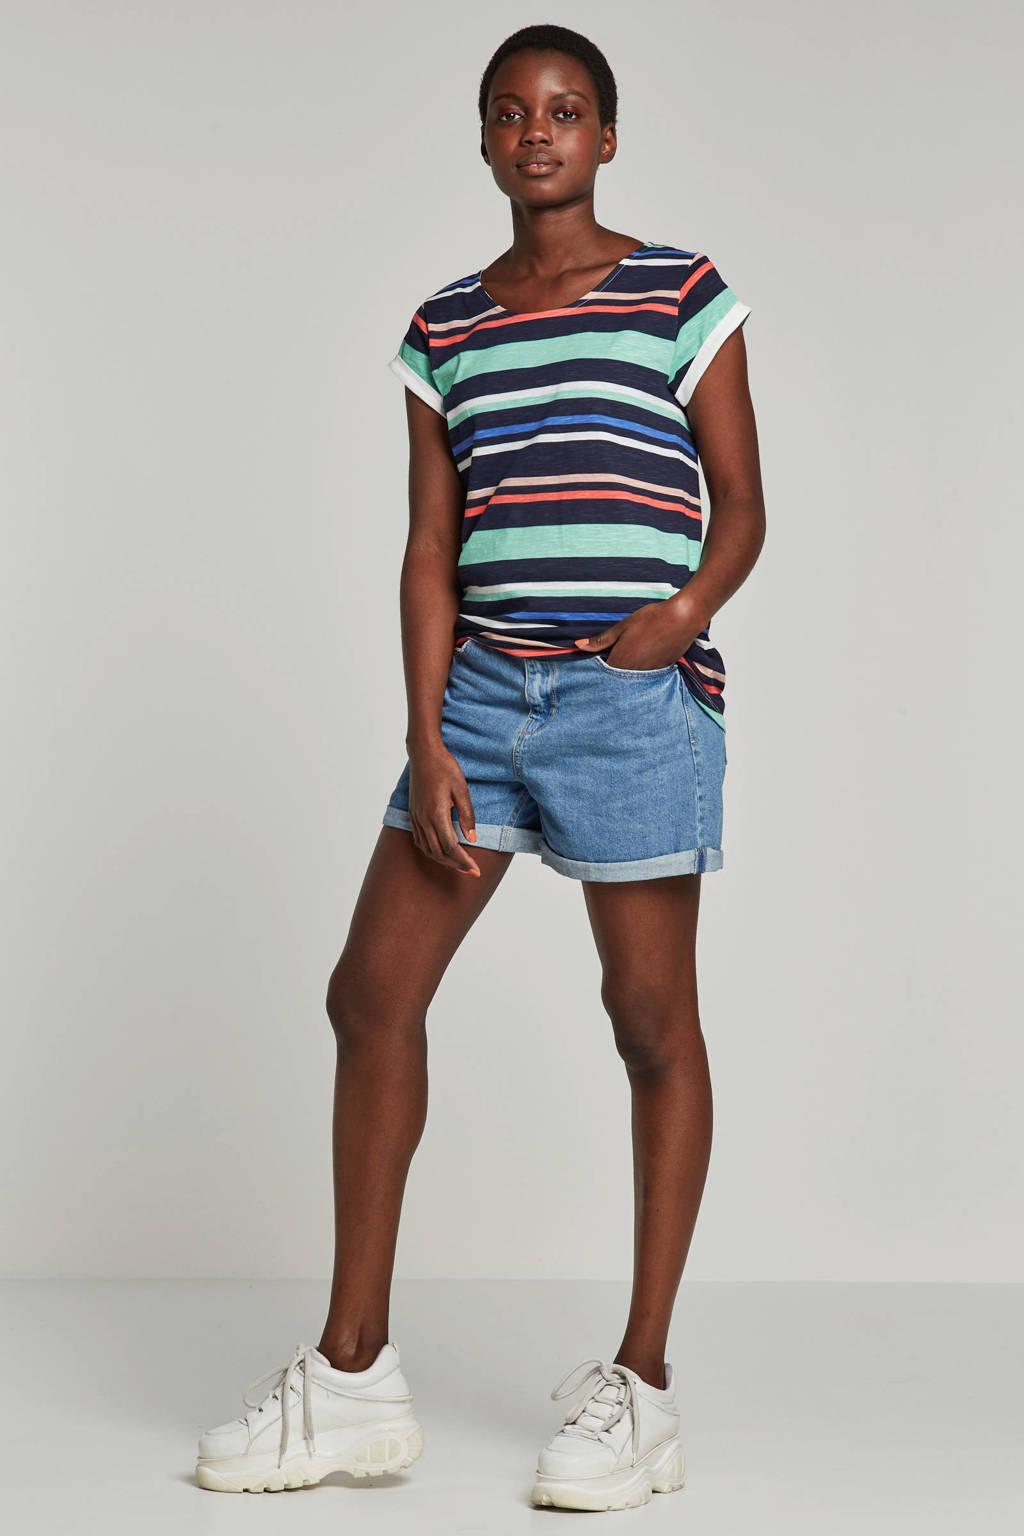 ESPRIT Women Casual gestreept T-shirt, Zwart/groen/blauw/wit